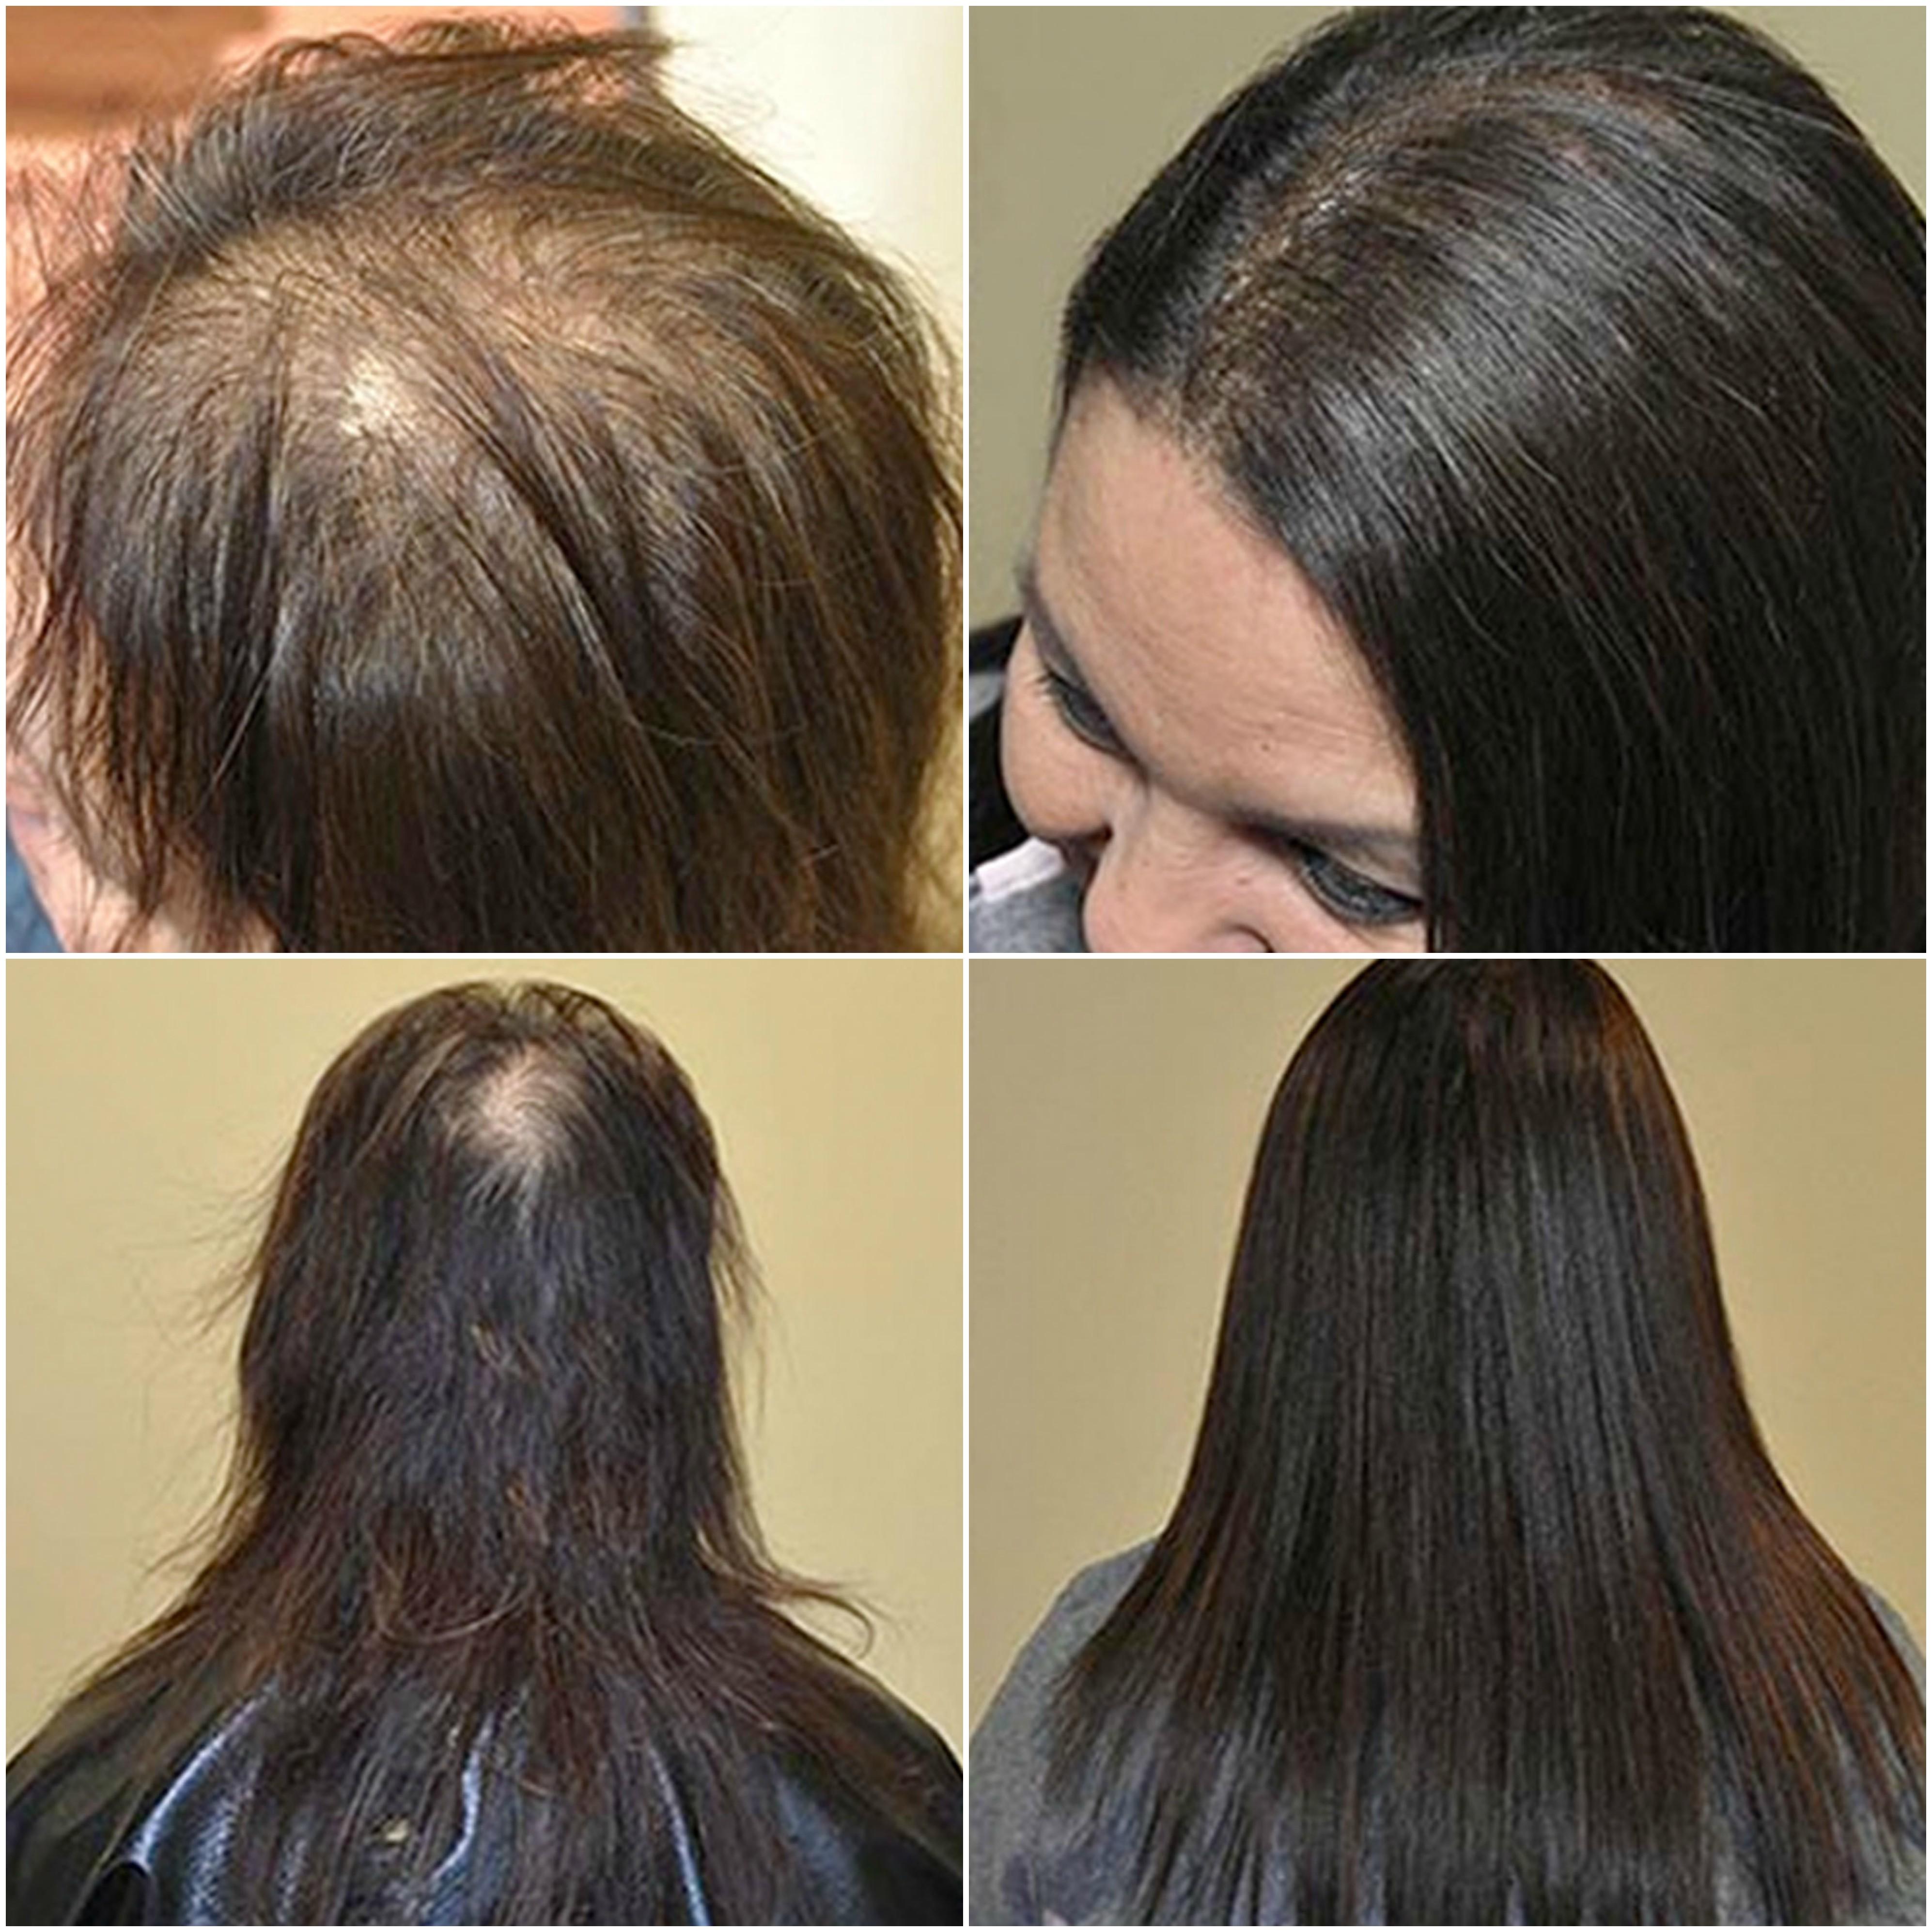 Keratin extensions on thin hair